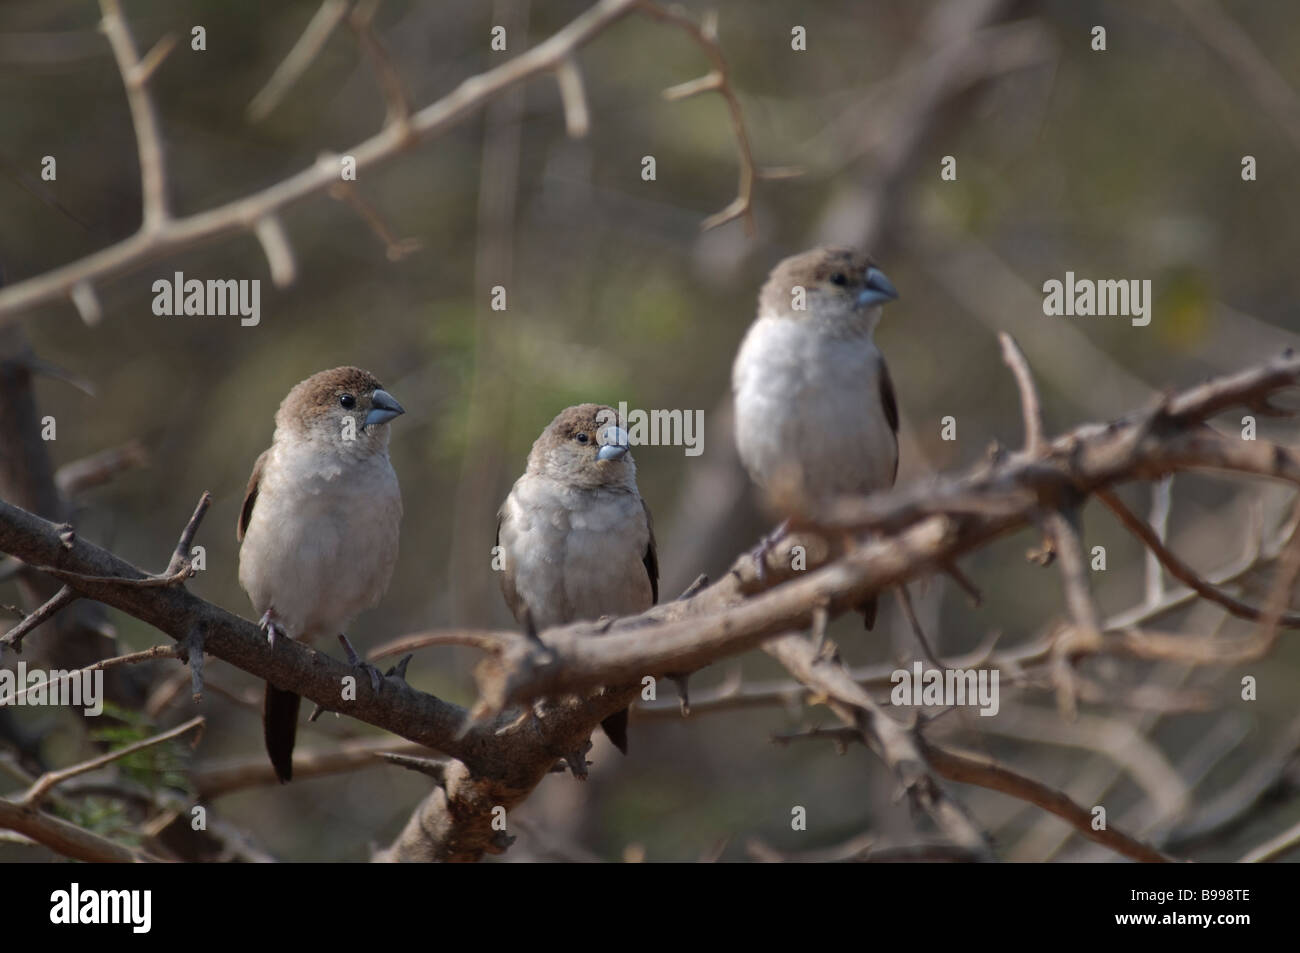 Three Indian Silverbills Lonchura malabarica sitting in a bush in Jaipur India - Stock Image